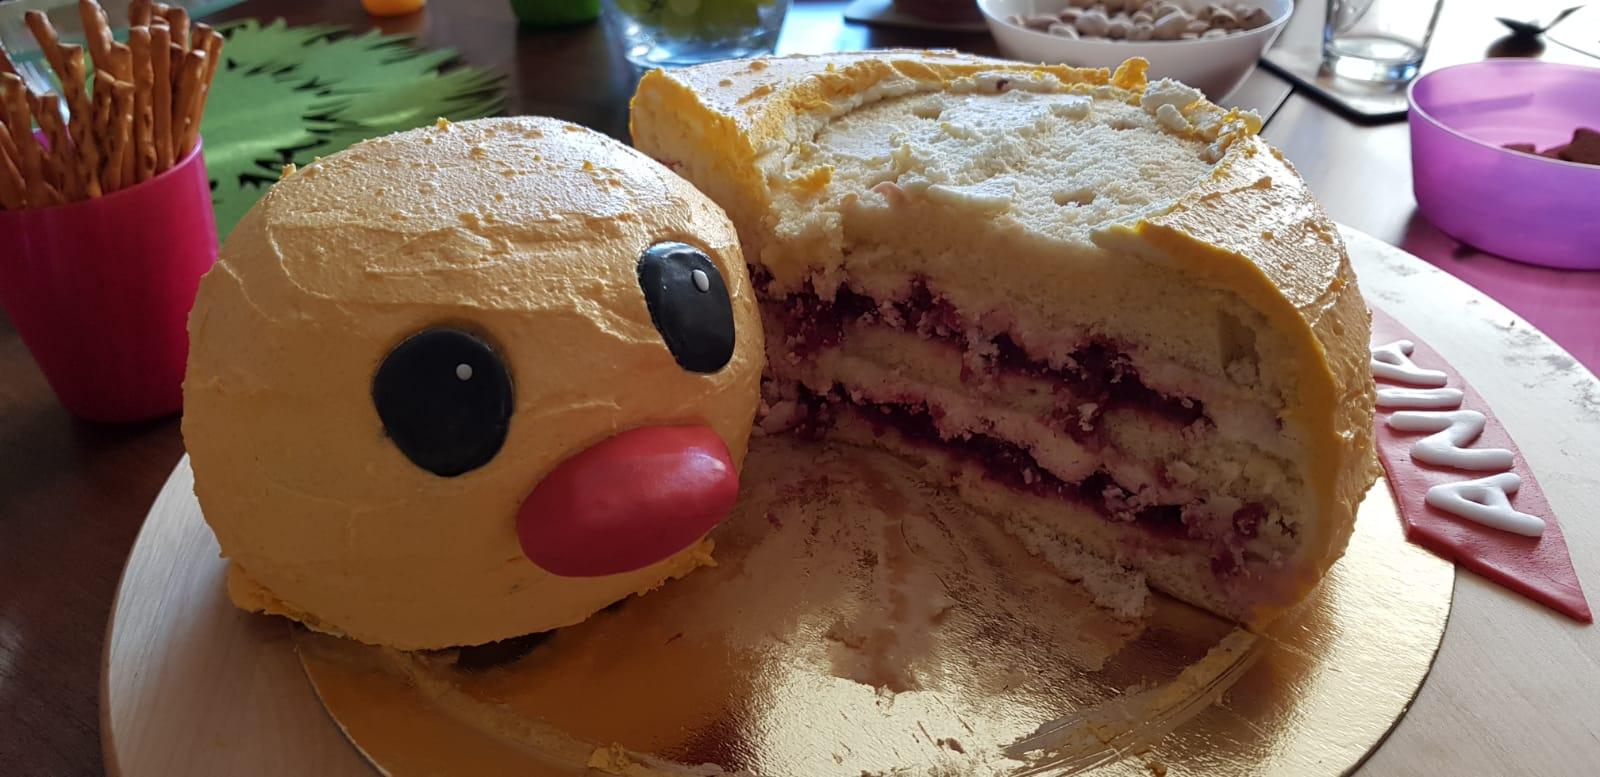 duckie birthday cake head side inside